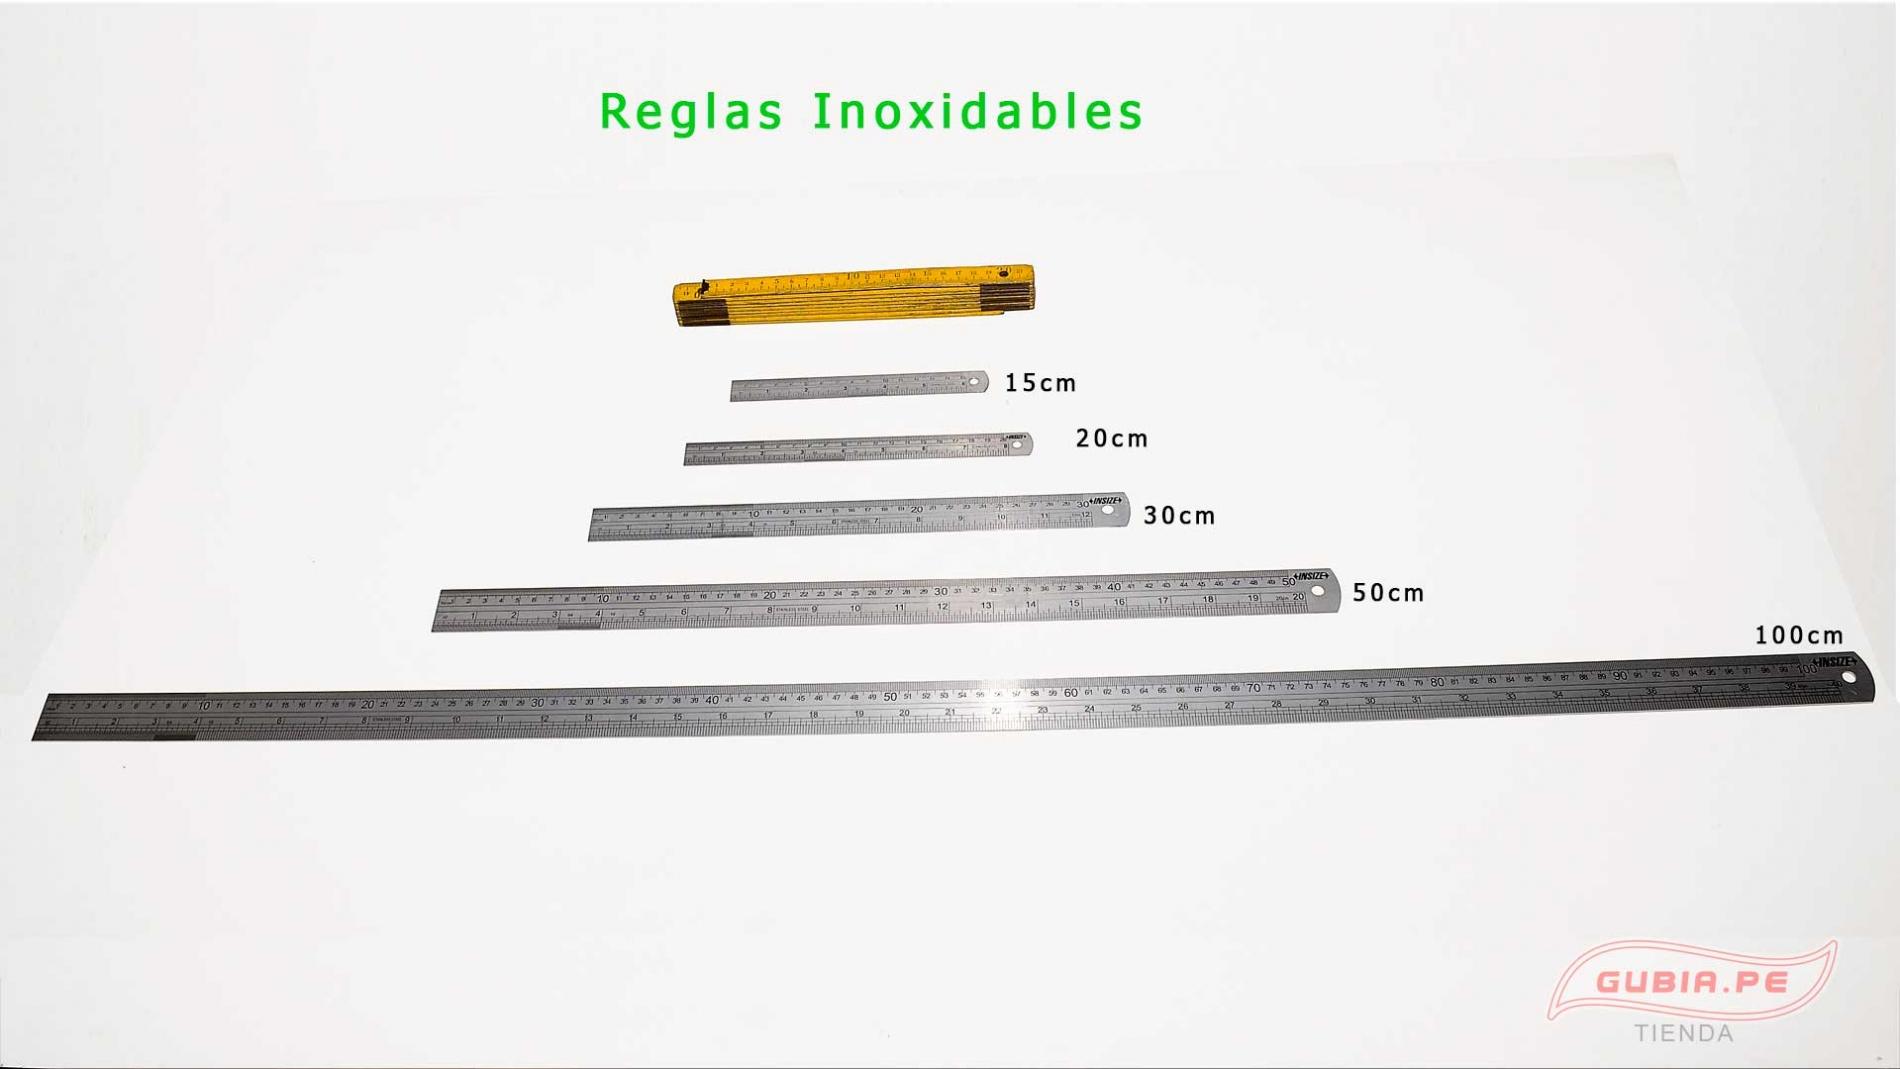 7110-500-Regla inoxidable 500mm Insize 7110-500-max-4.